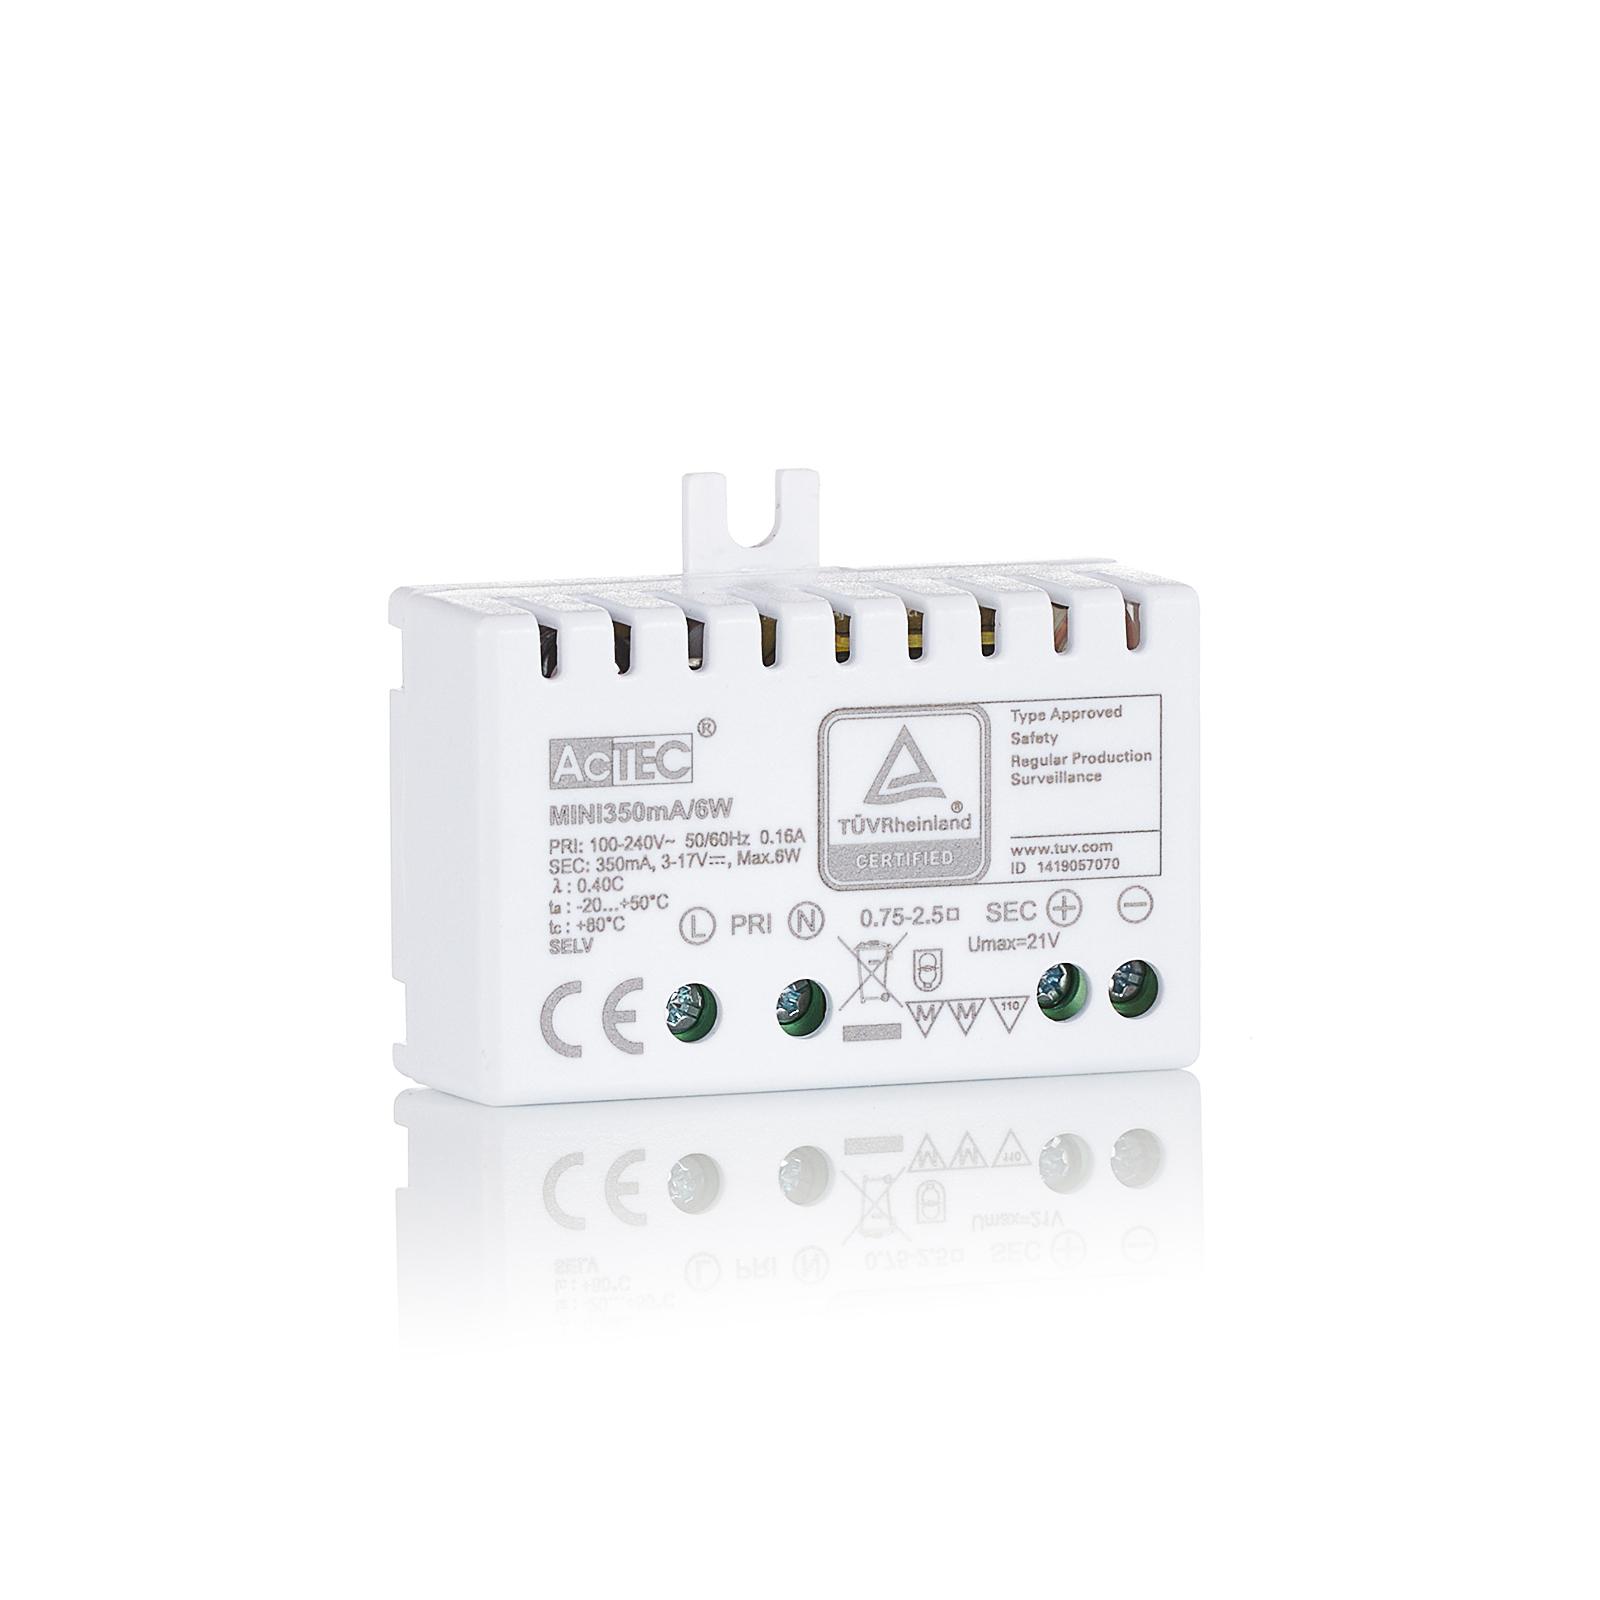 AcTEC Mini LED driver CC 350mA, 6W, IP20